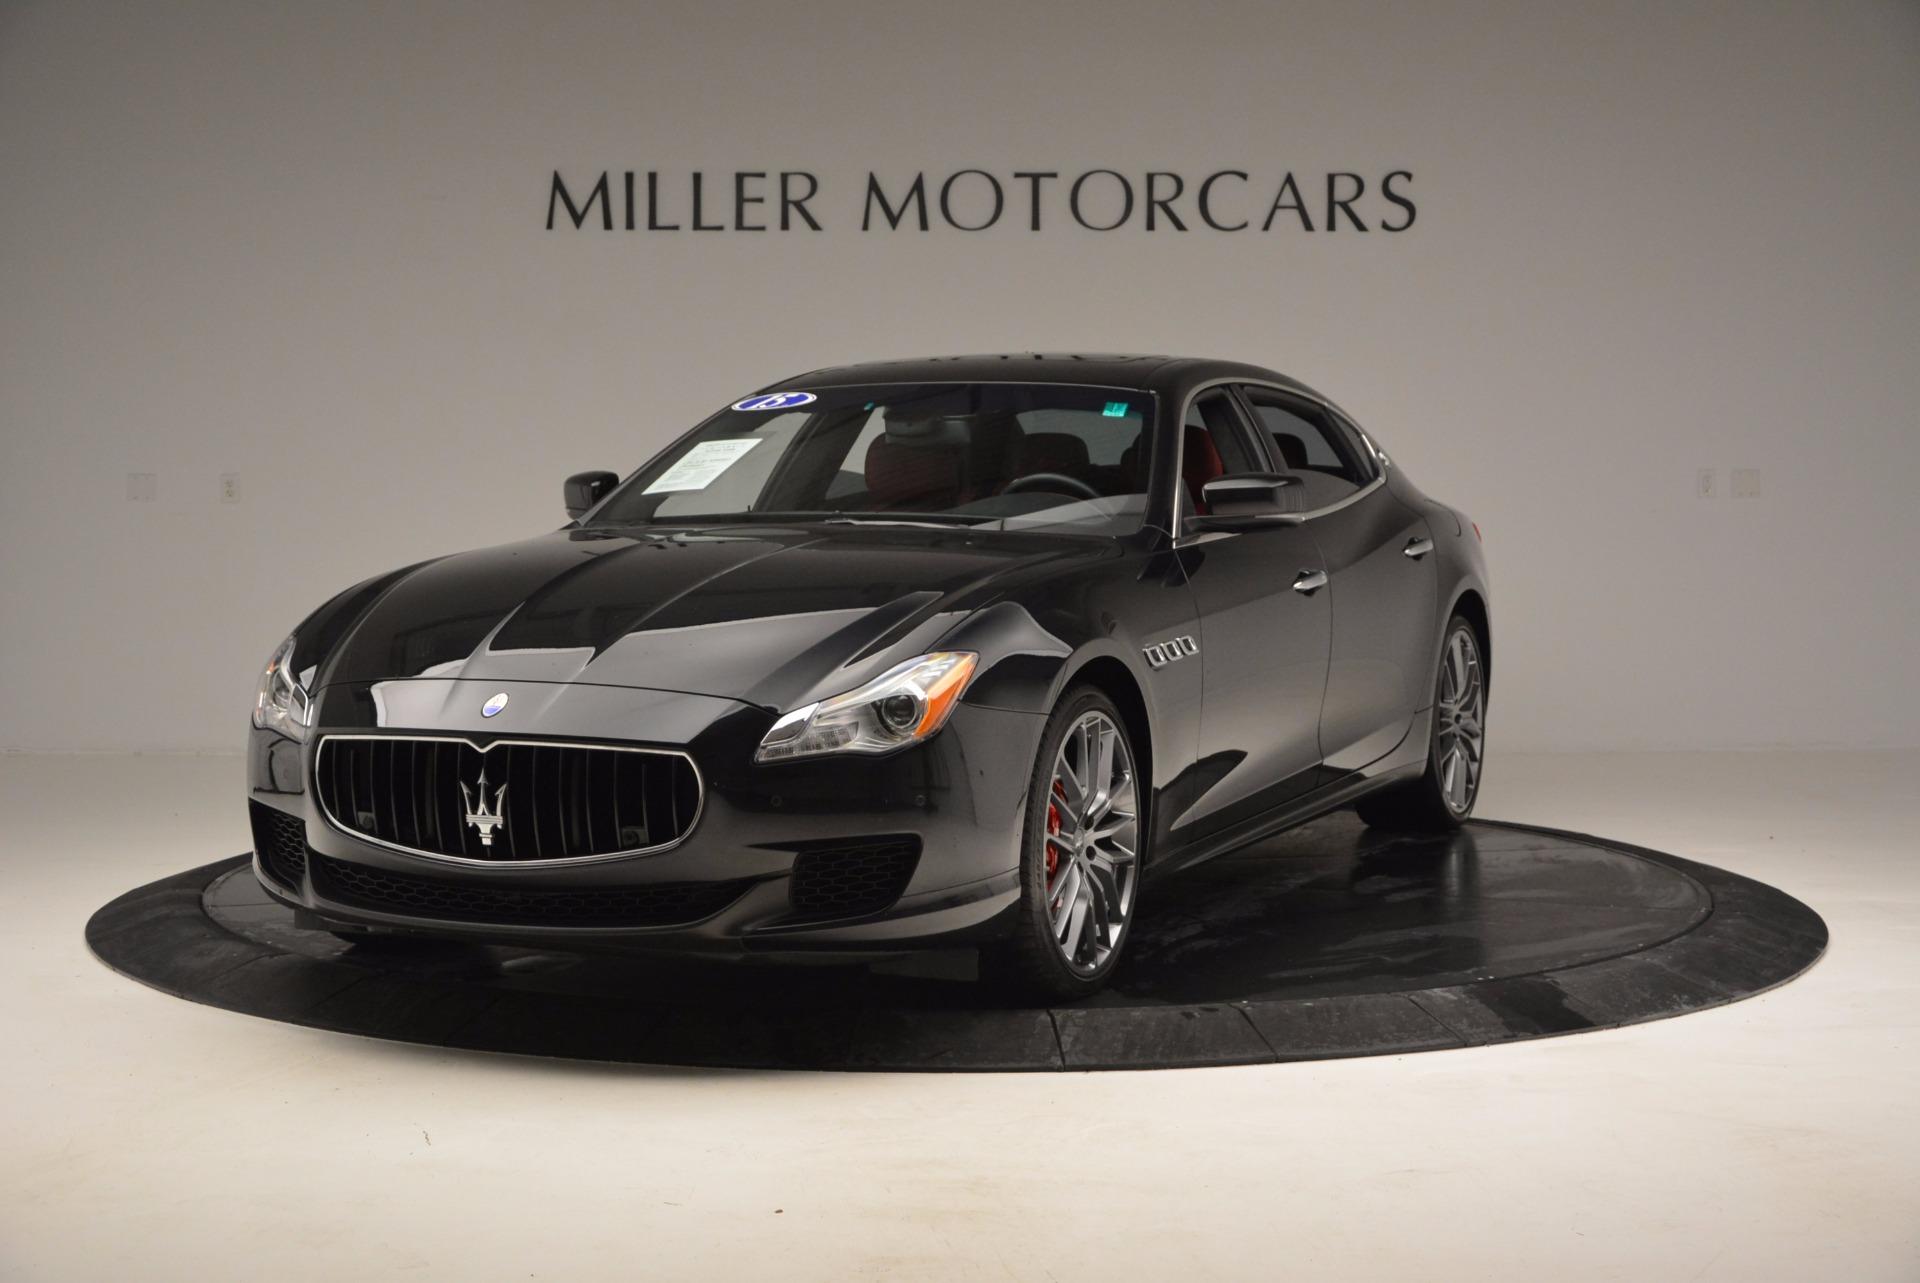 Used 2015 Maserati Quattroporte S Q4 for sale Sold at McLaren Greenwich in Greenwich CT 06830 1